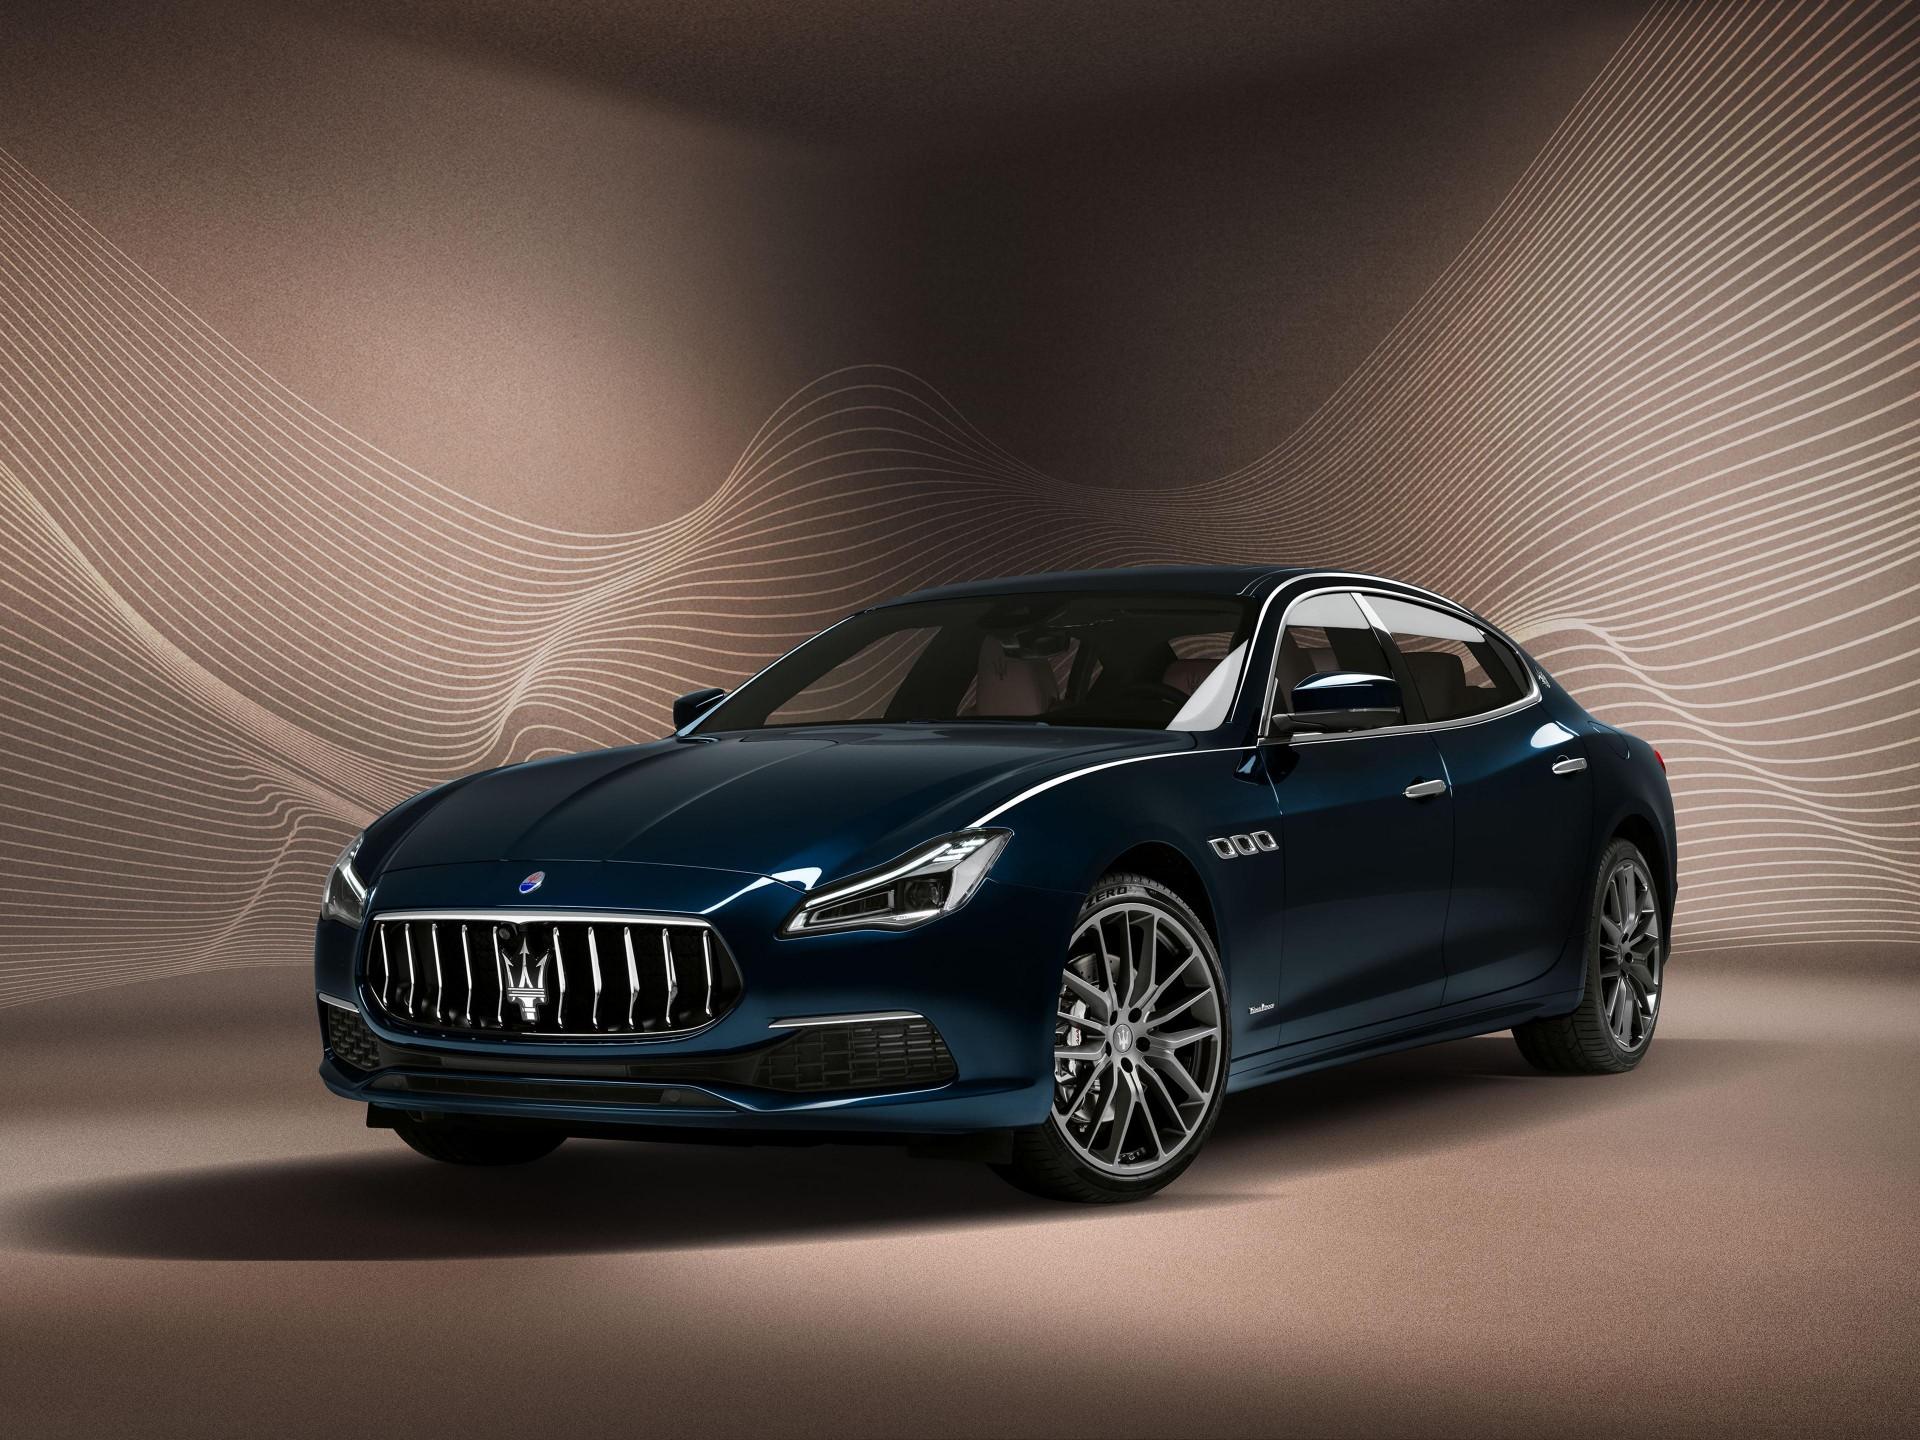 Maserati Quattroporte GranLusso Royale 2020 5K HD desktop 1920x1440